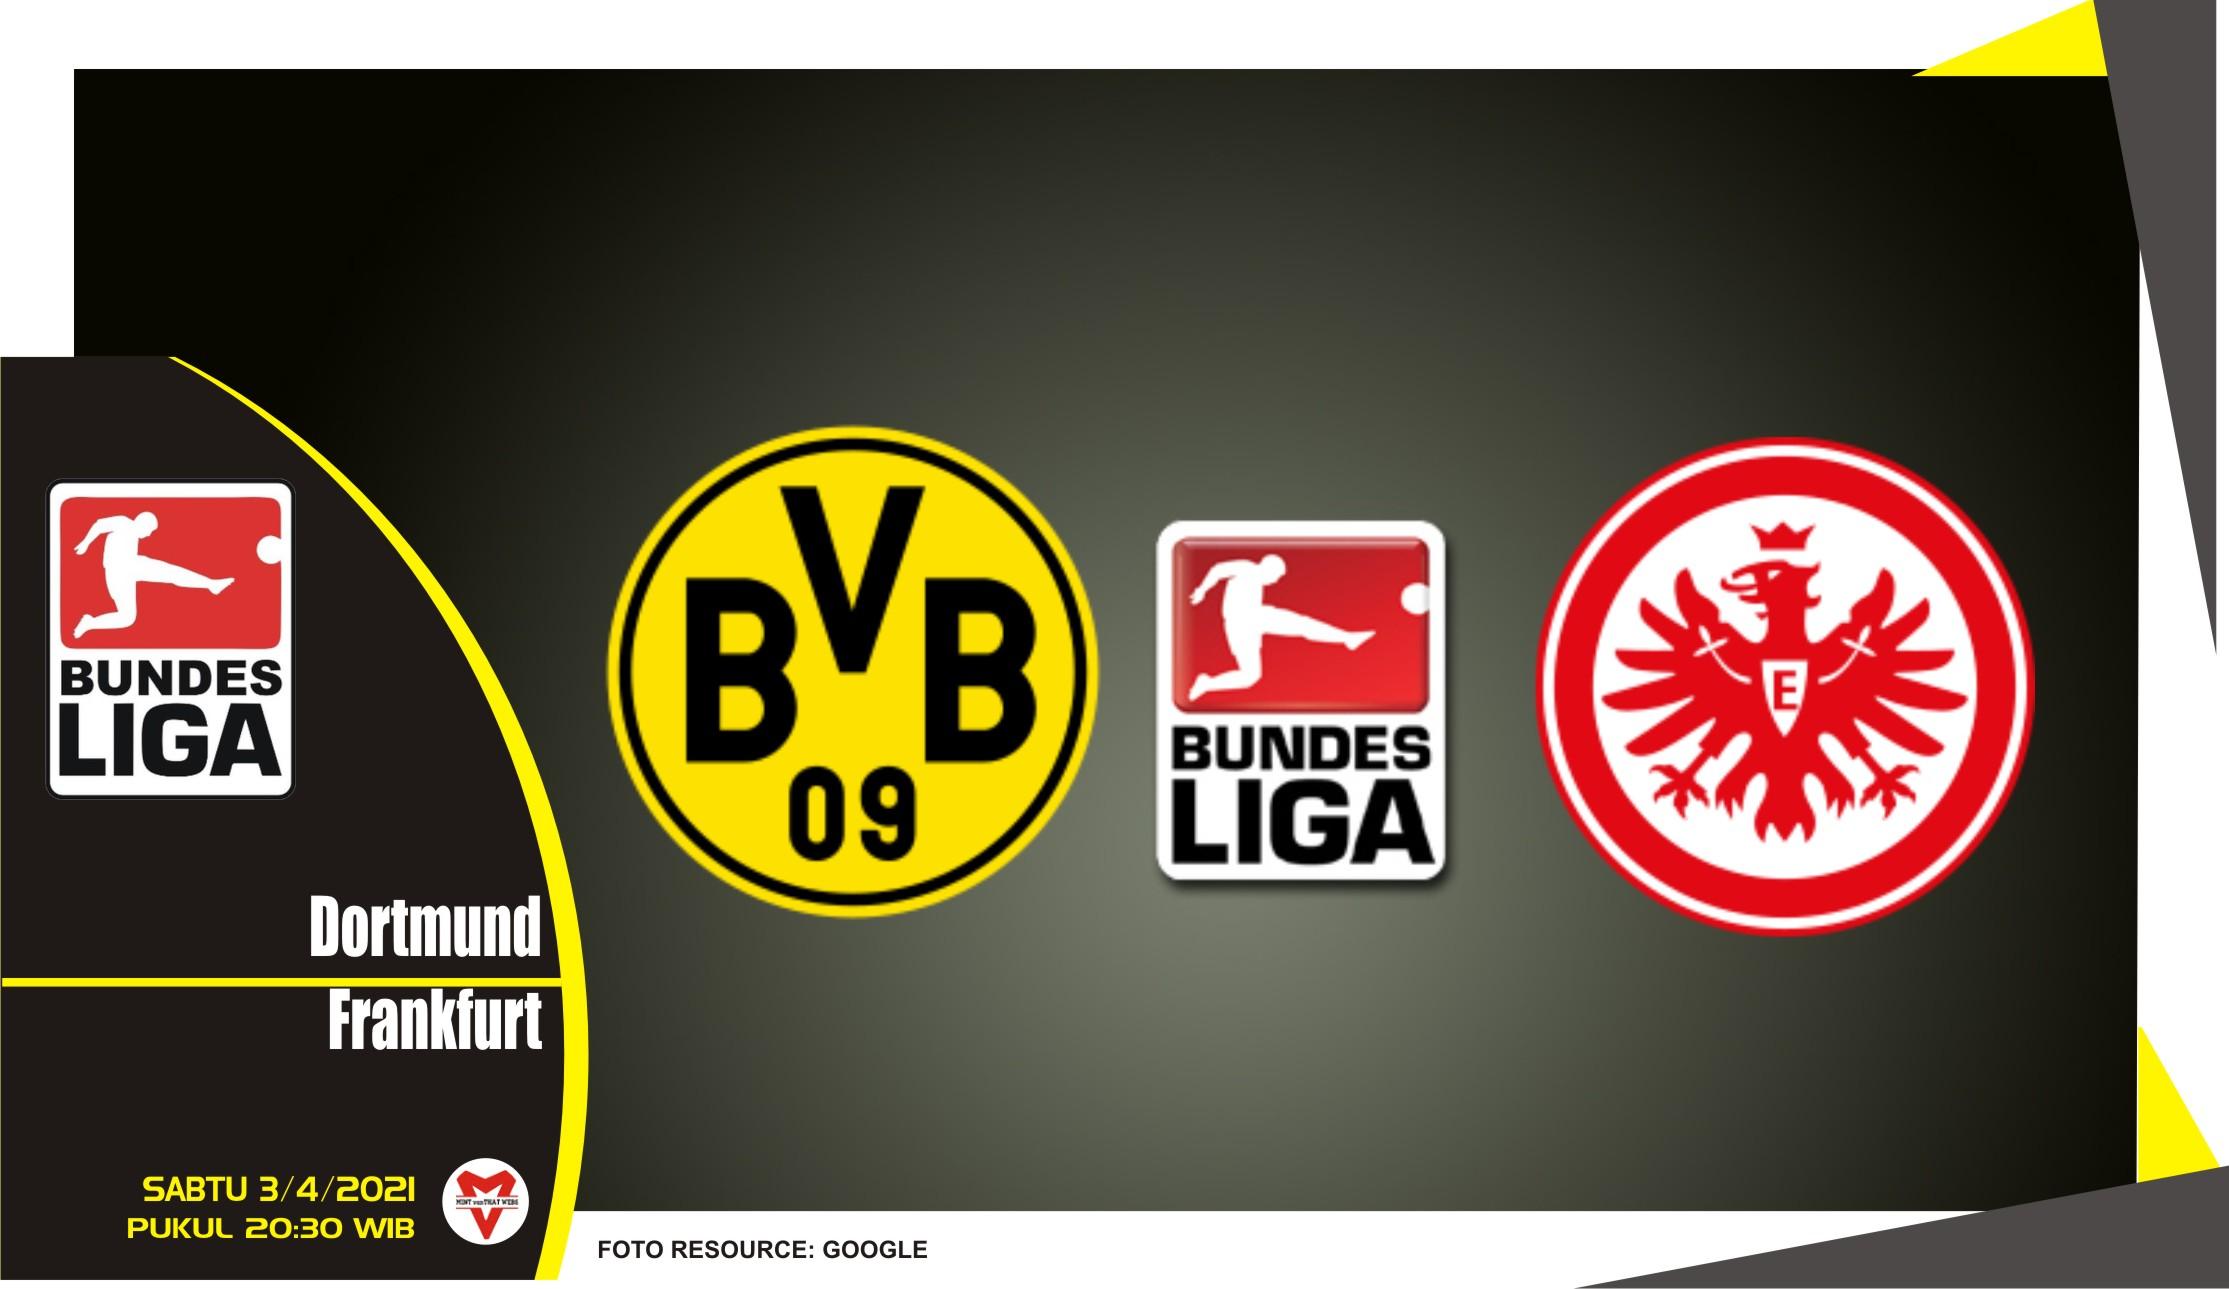 Prediksi Liga Jerman: Dortmund vs Eintracht Frankfurt - 3 April 2021